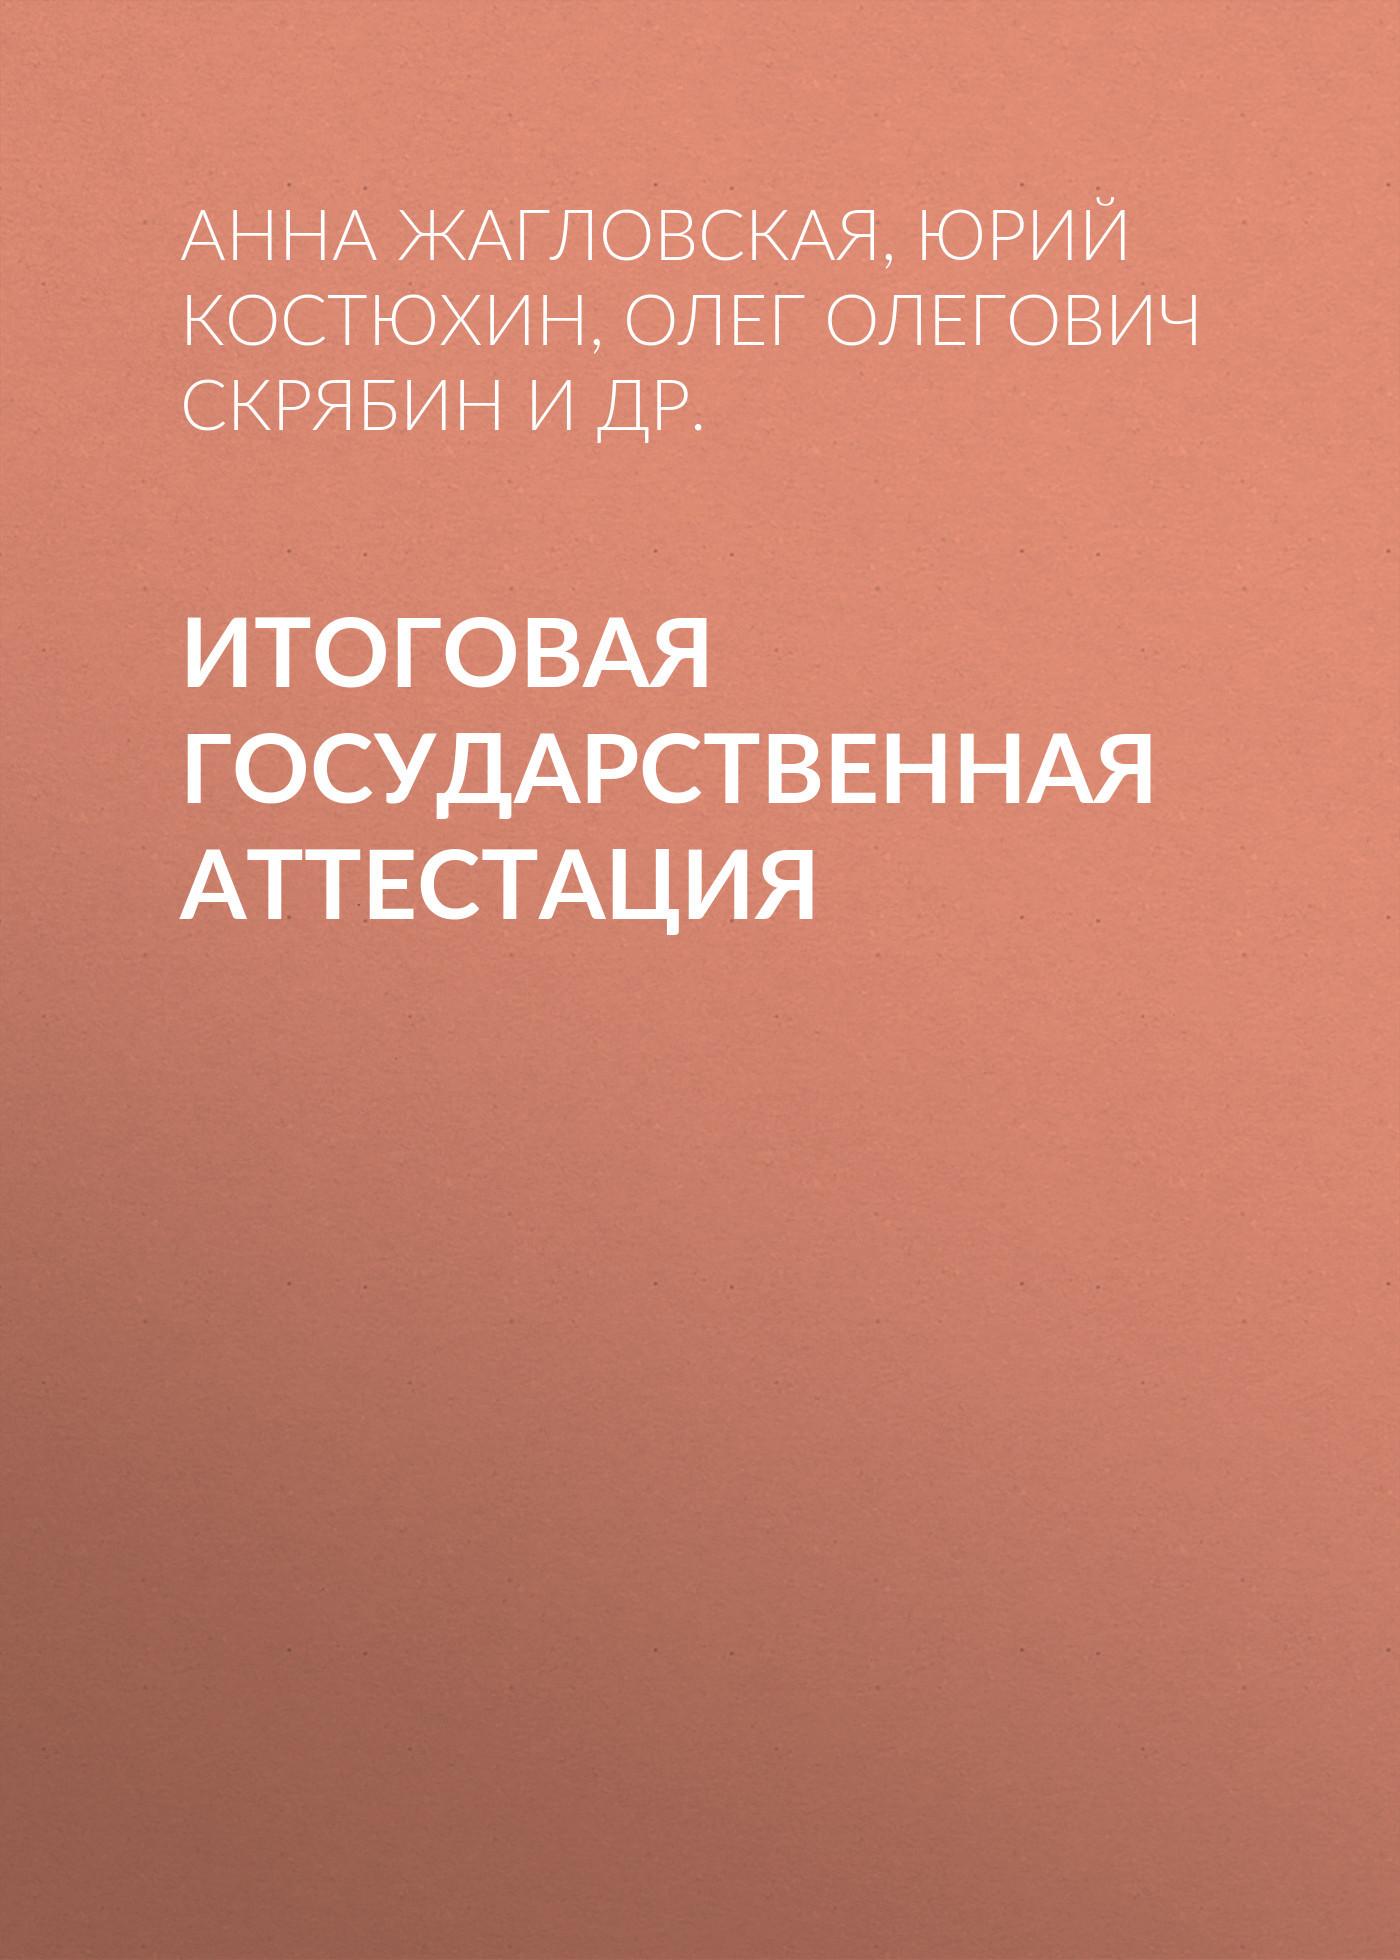 Юрий Костюхин. Итоговая государственная аттестация